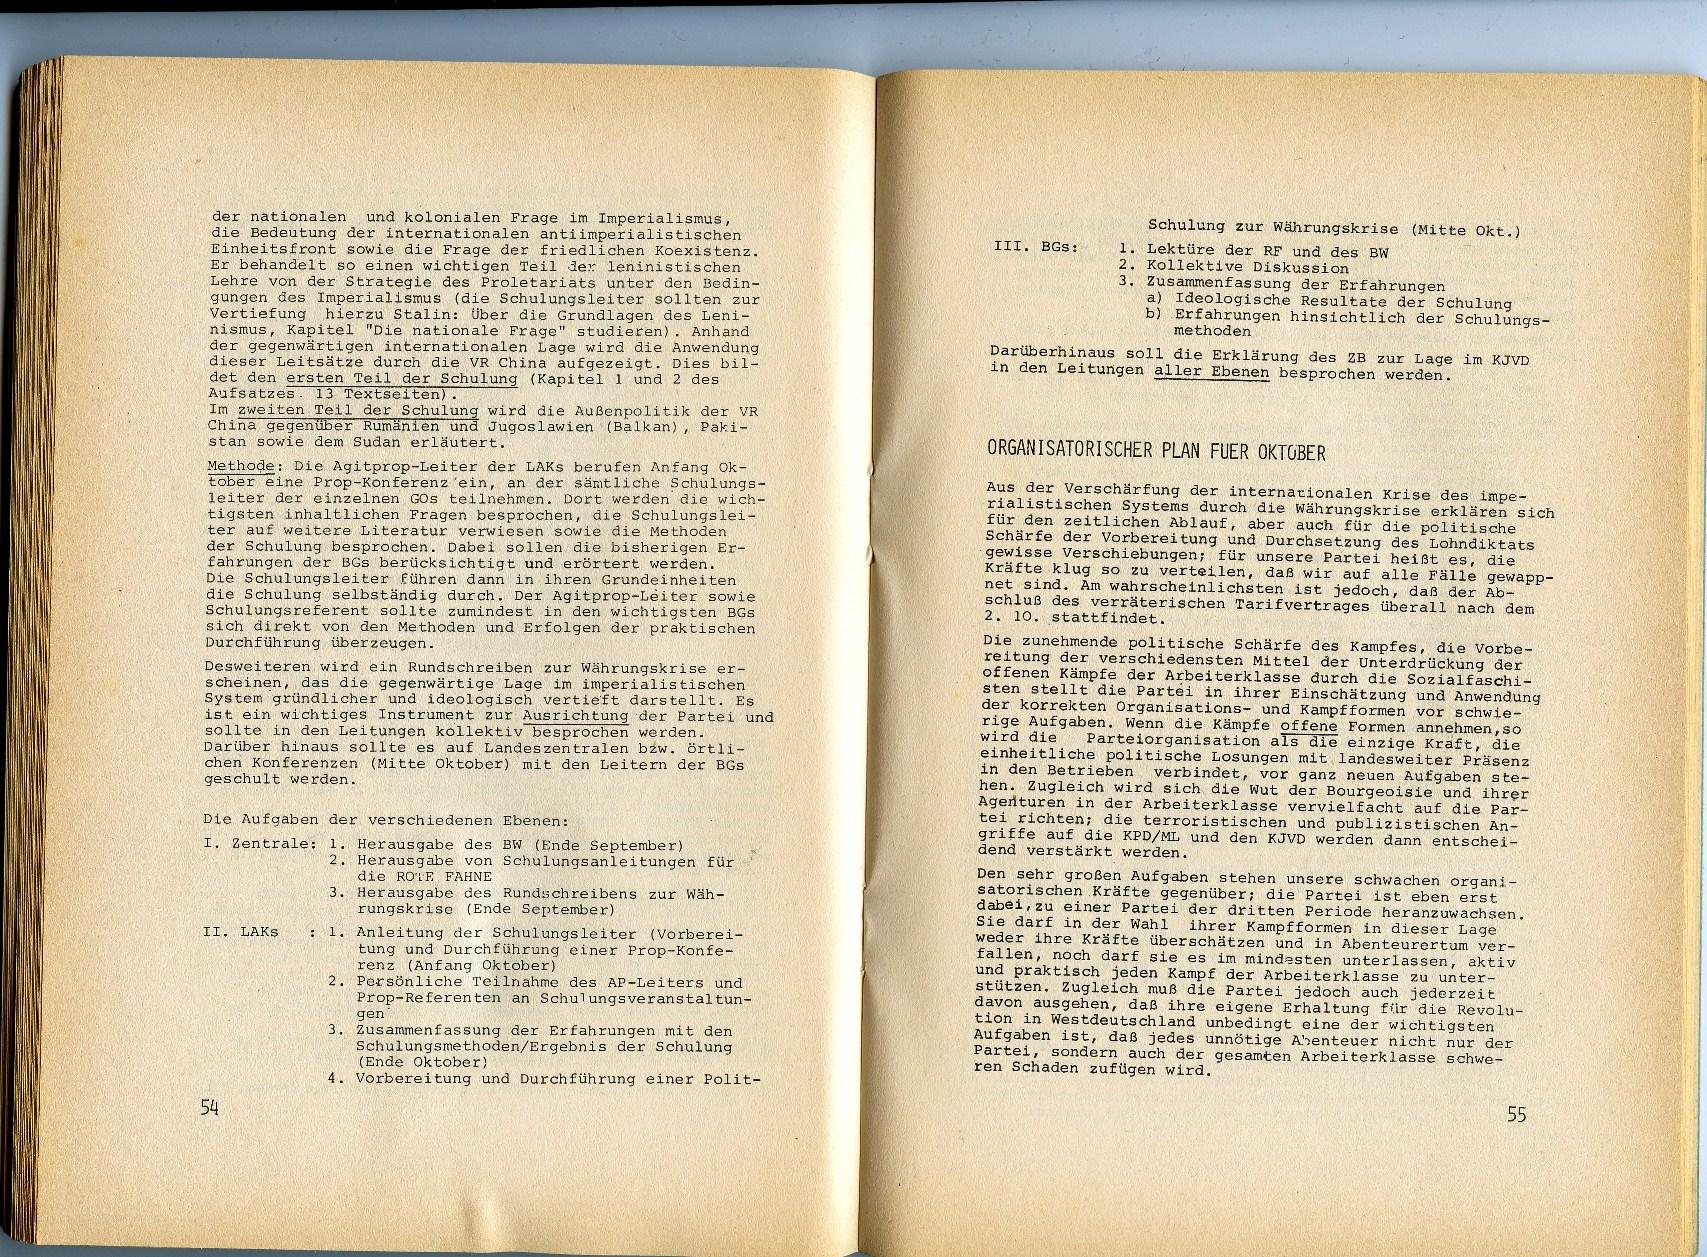 ZB_Parteiarbeiter_1971_08_29